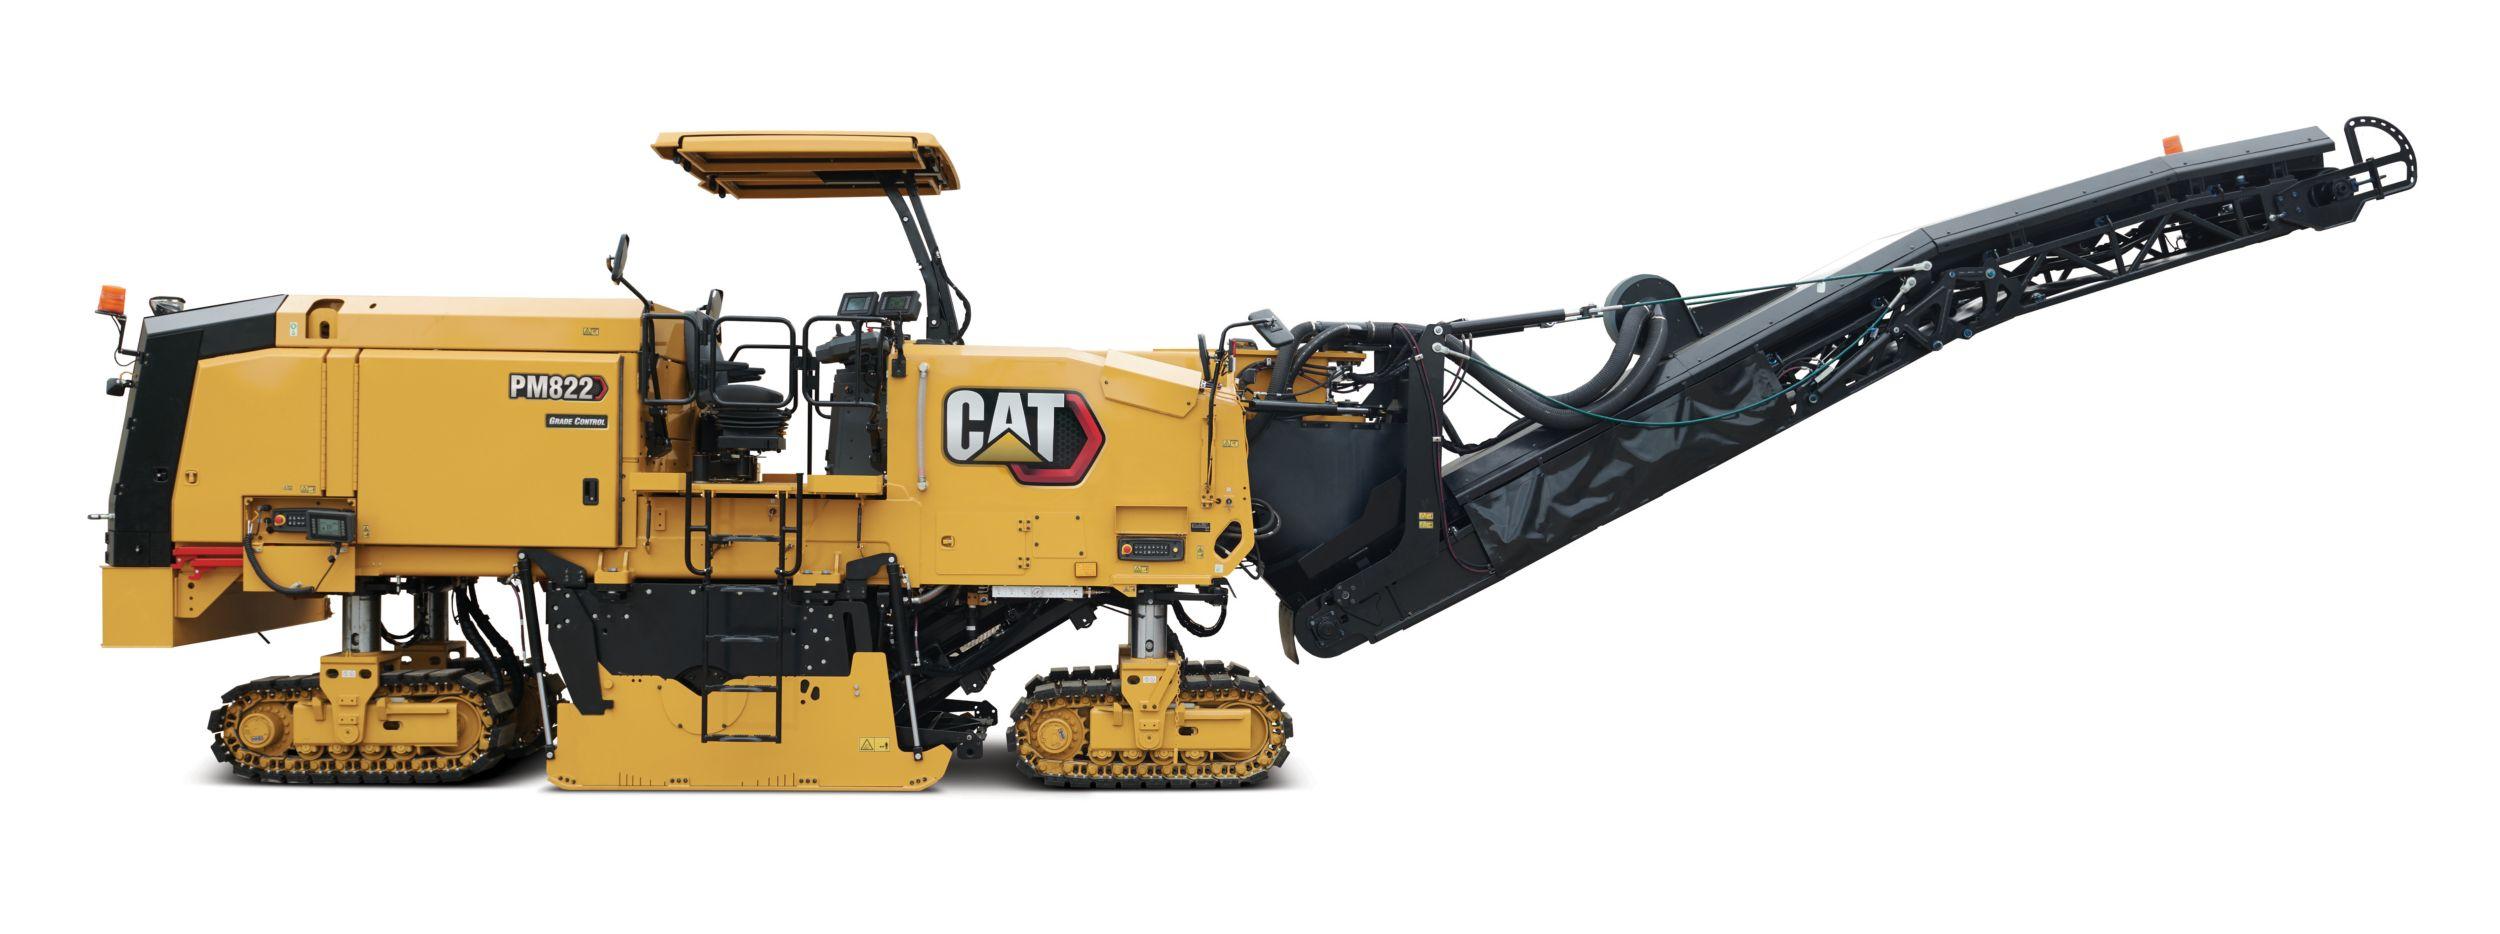 Perfiladora de pavimentos en frío Cat PM822